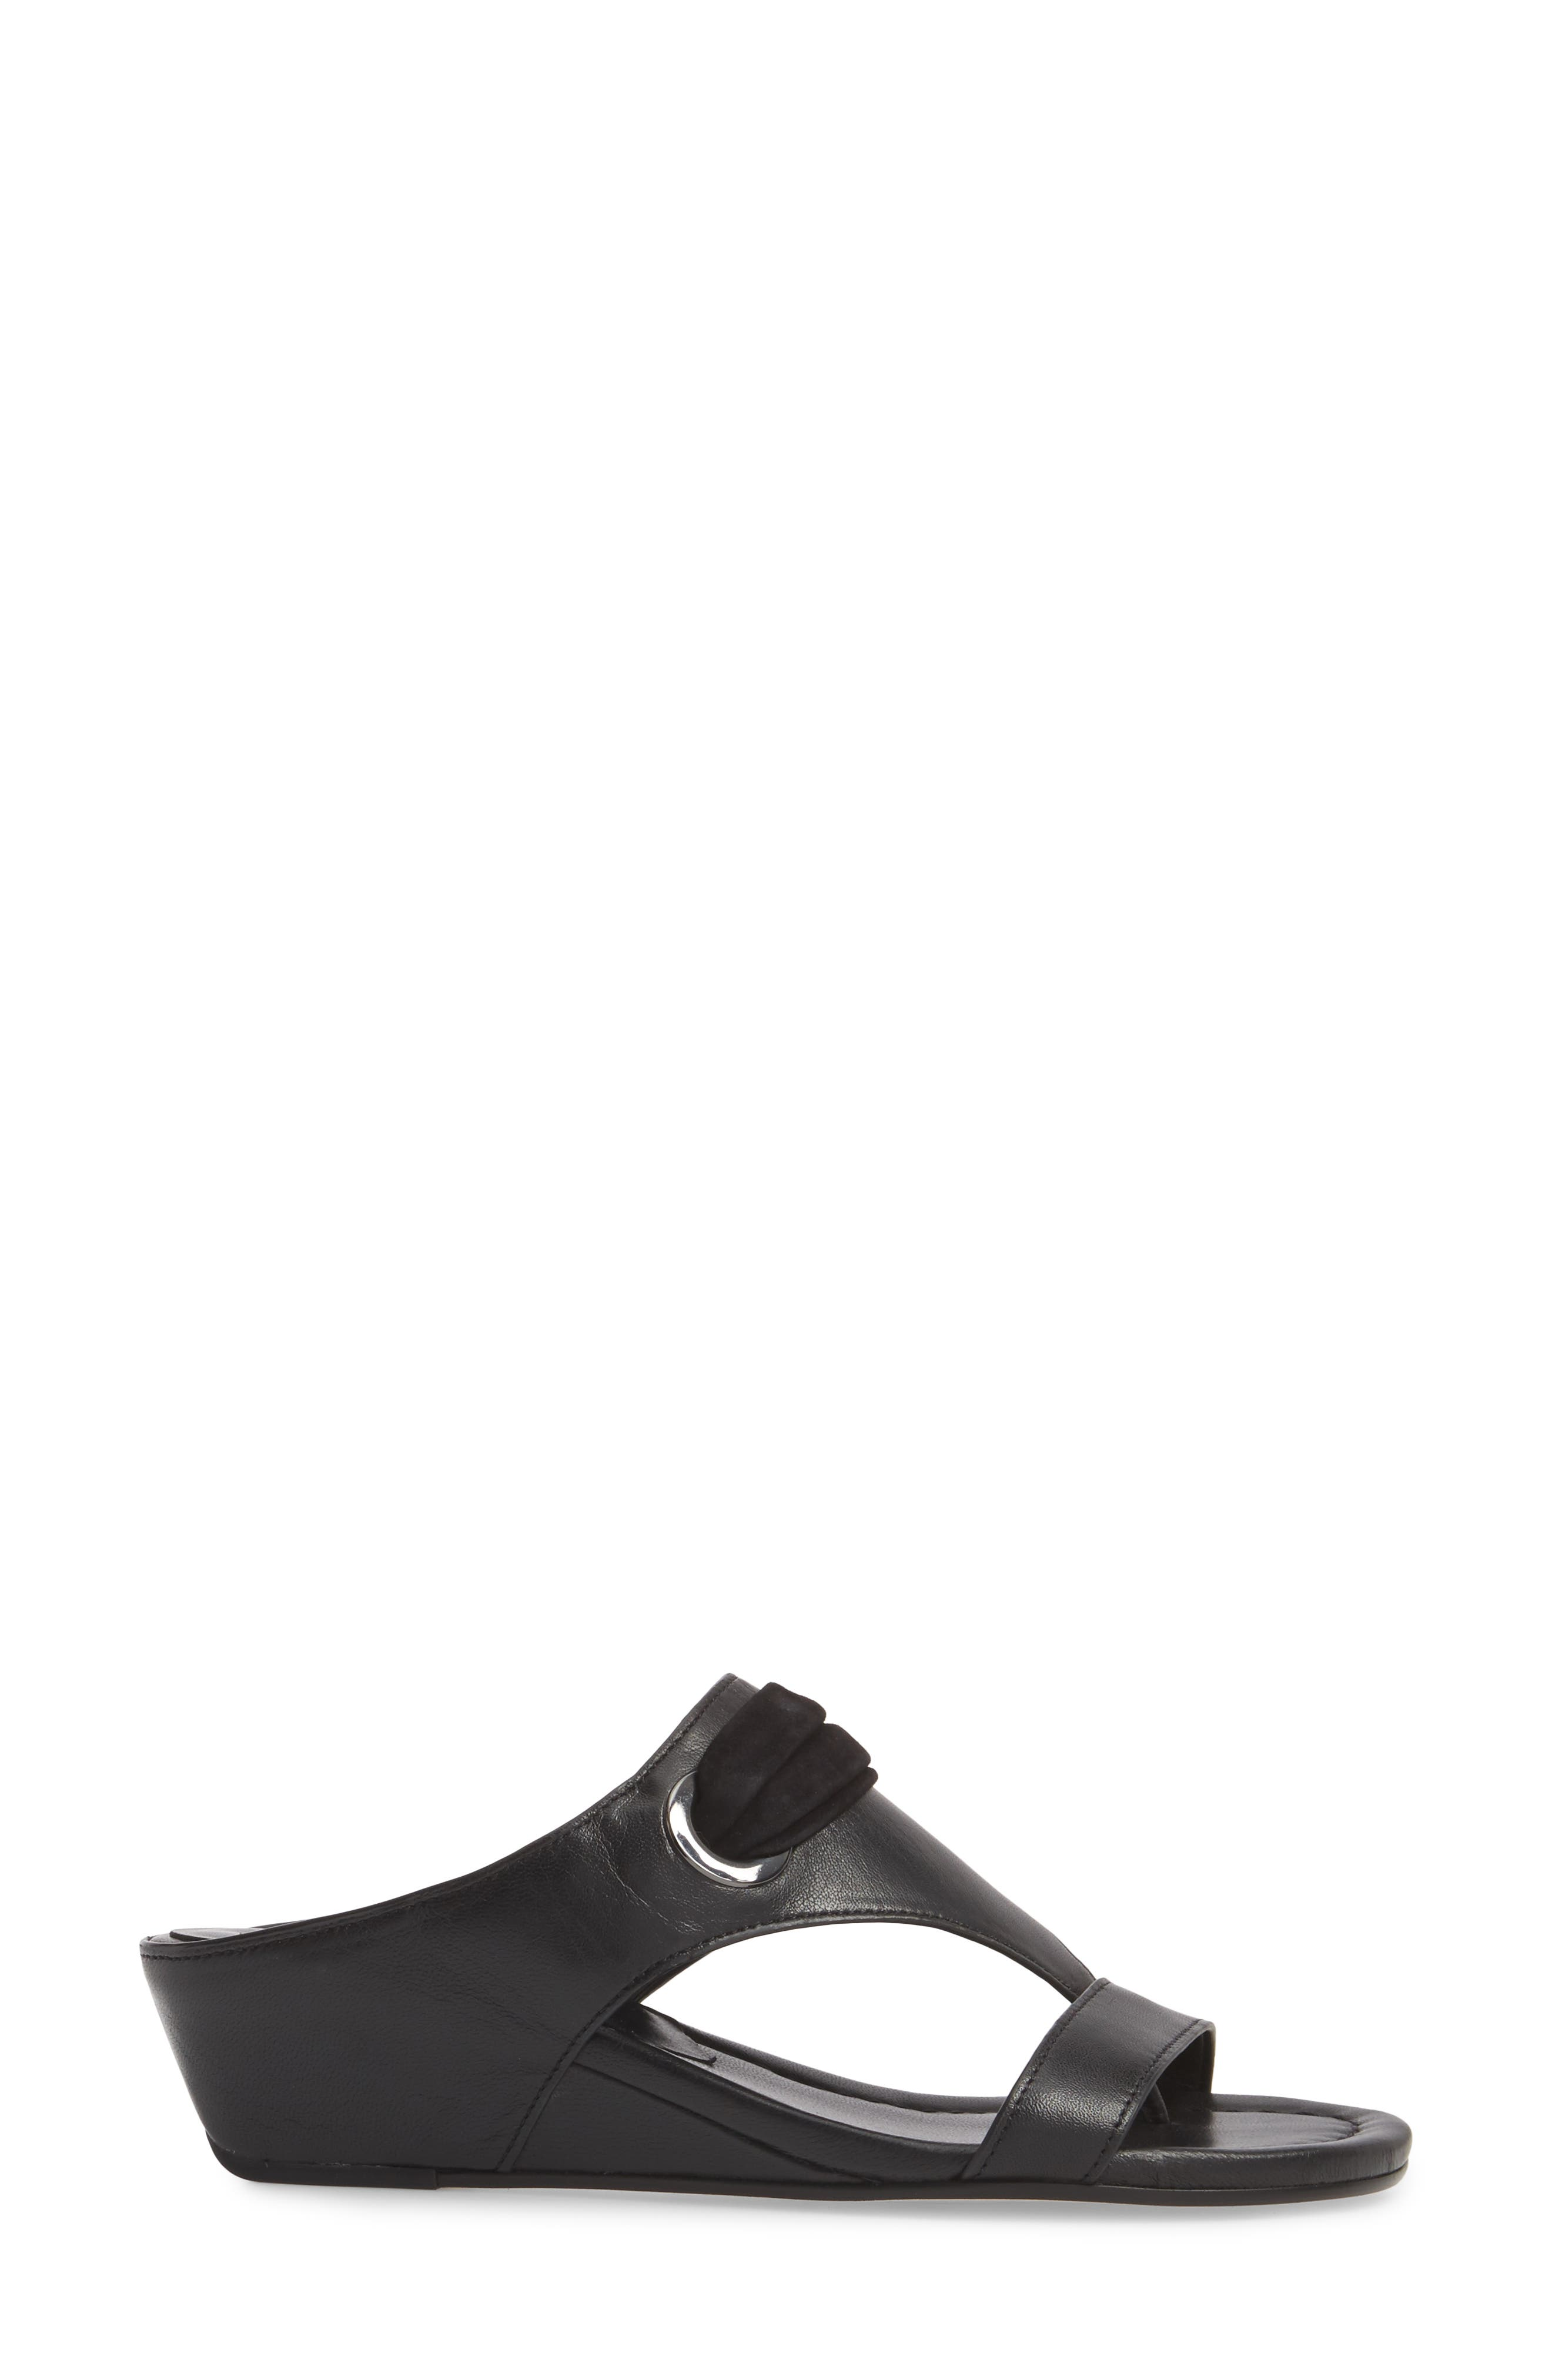 Dionne Wedge Sandal,                             Alternate thumbnail 3, color,                             Black Leather